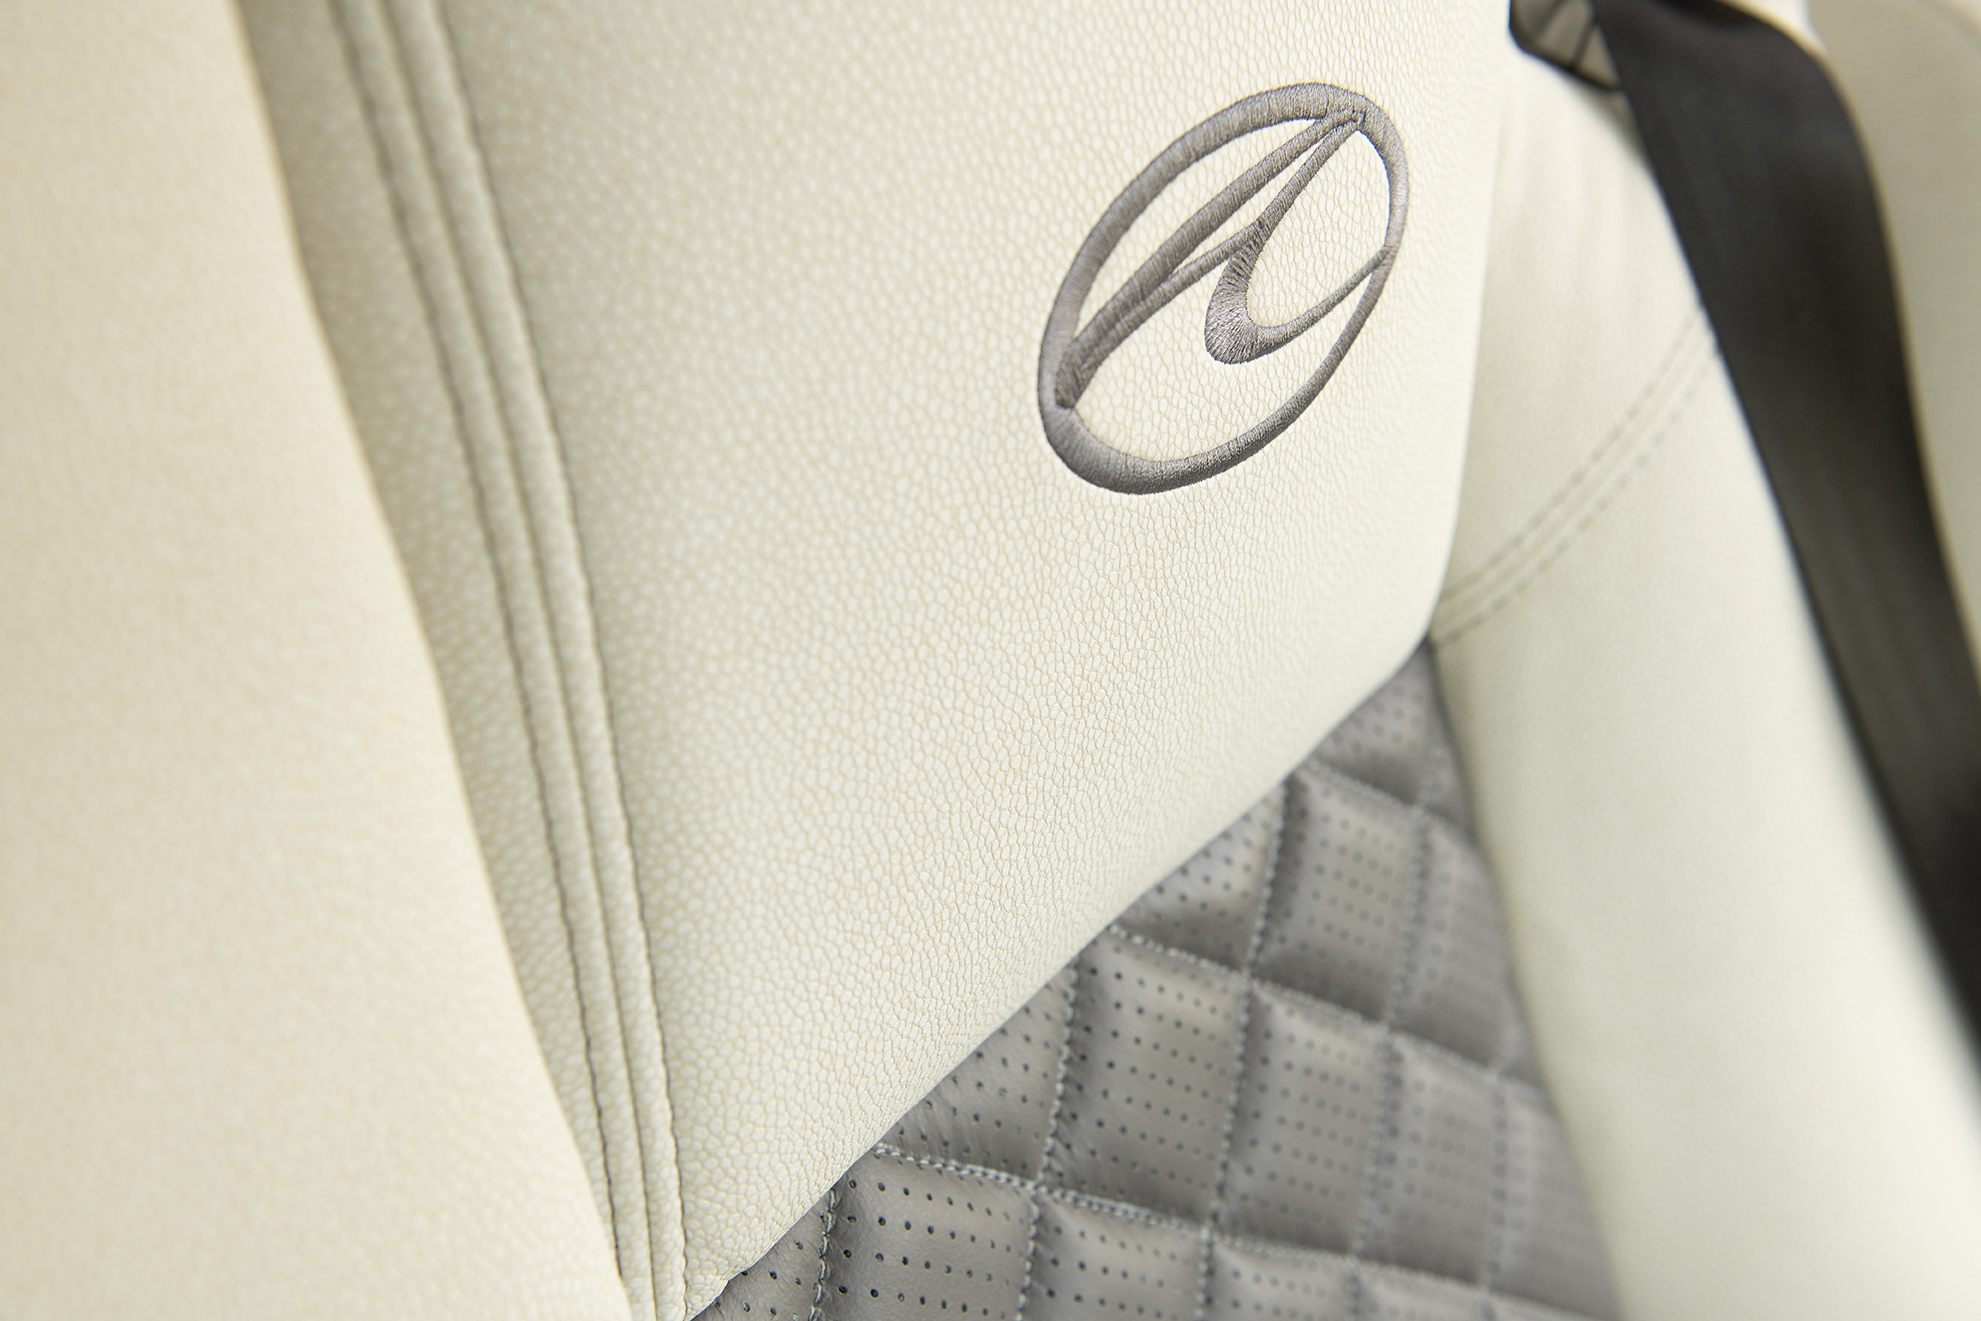 A Clogo SEAT Eagle45 K seat 2143